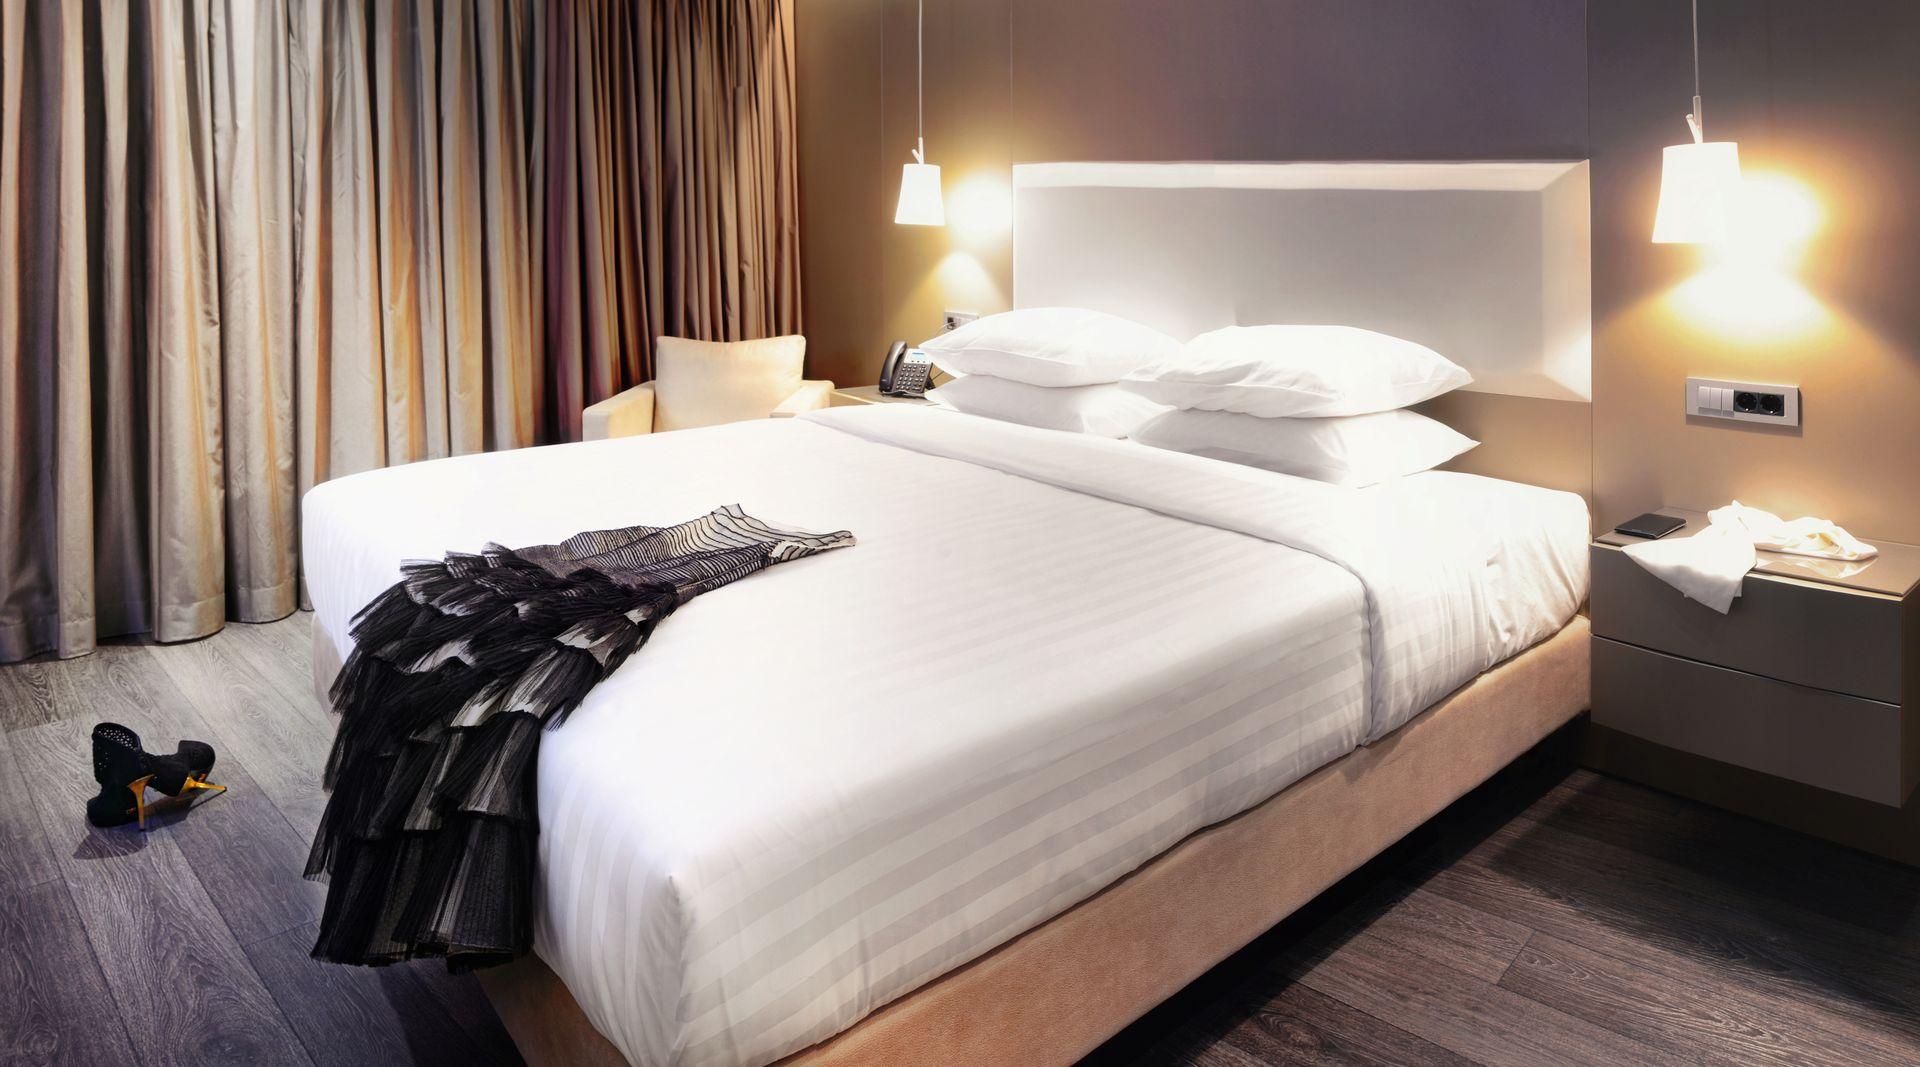 4* SAZ City Life Hotel Ioannina - Ιωάννινα ✦ 2 Ημέρες